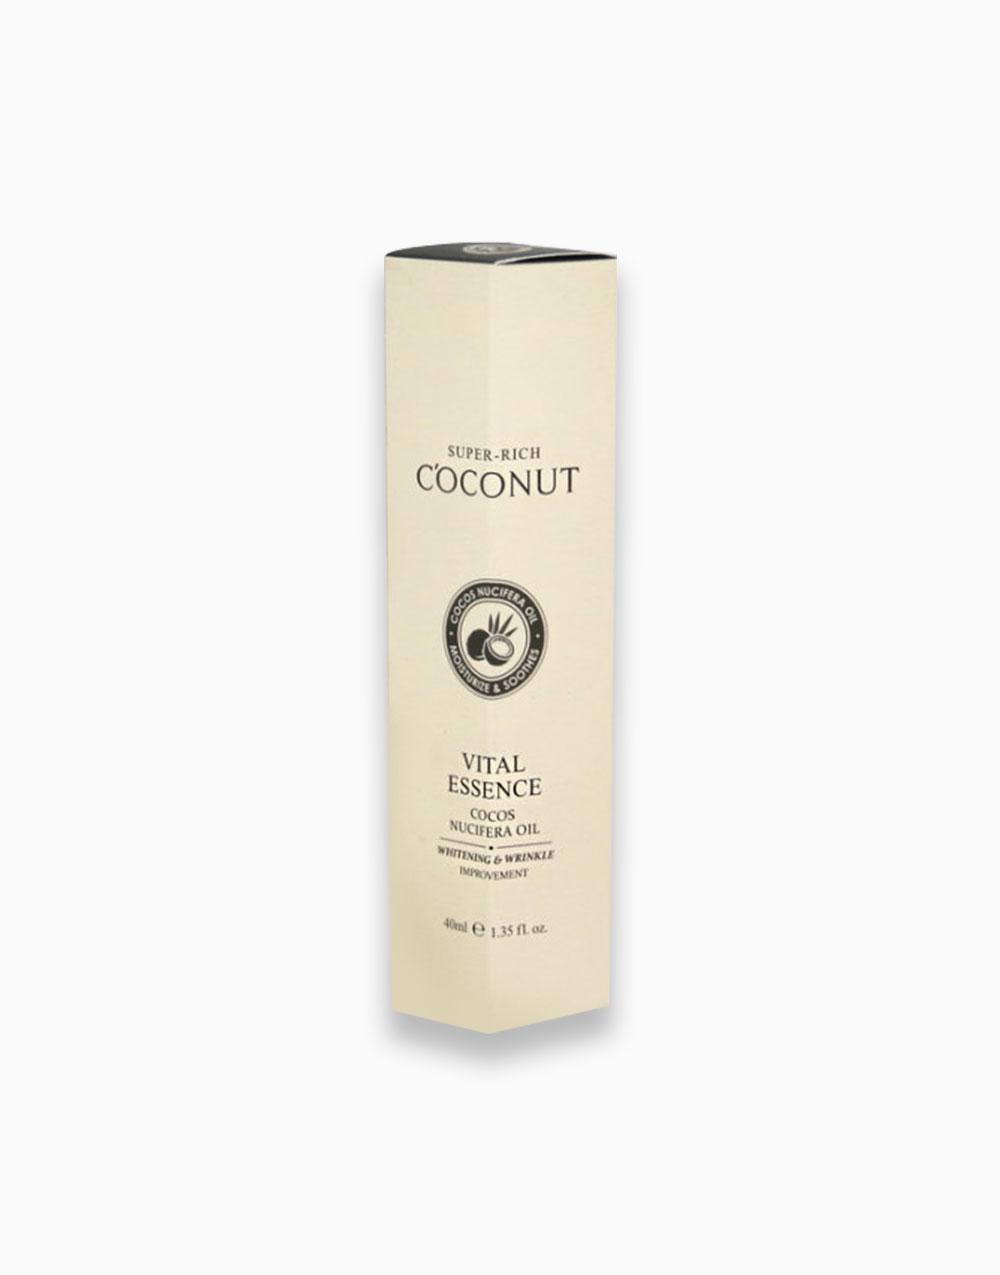 Super Rich Coconut Vital Essence by Esfolio